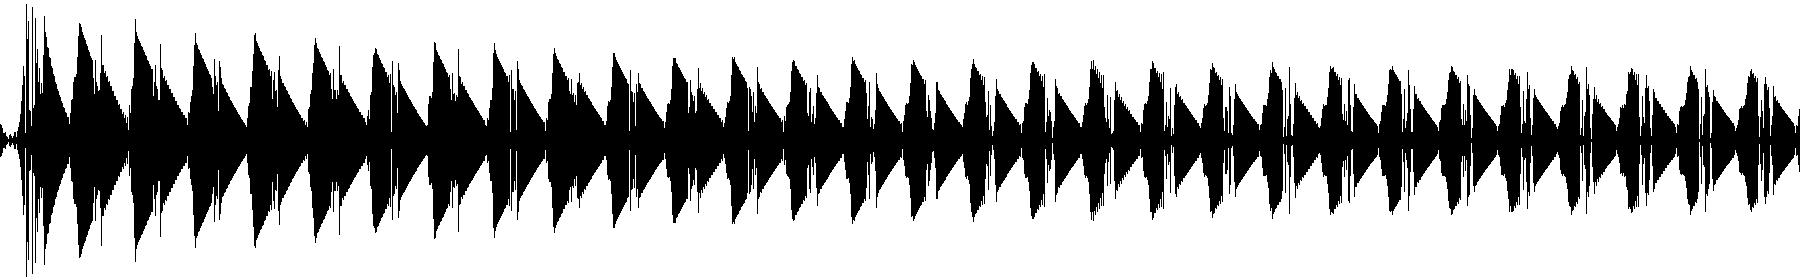 vedh synth cut 228 f